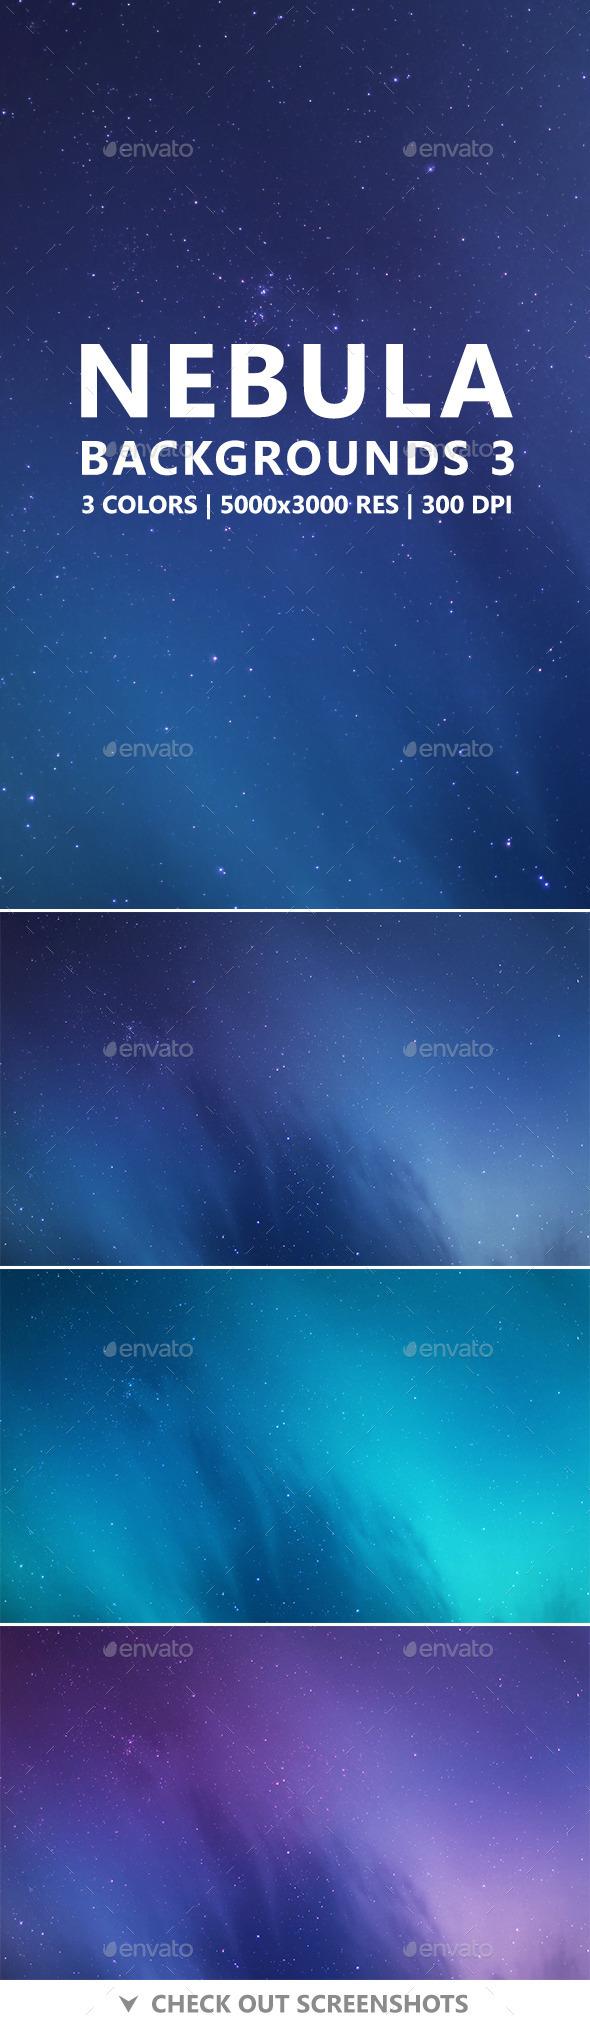 Nebula Backgrounds 3